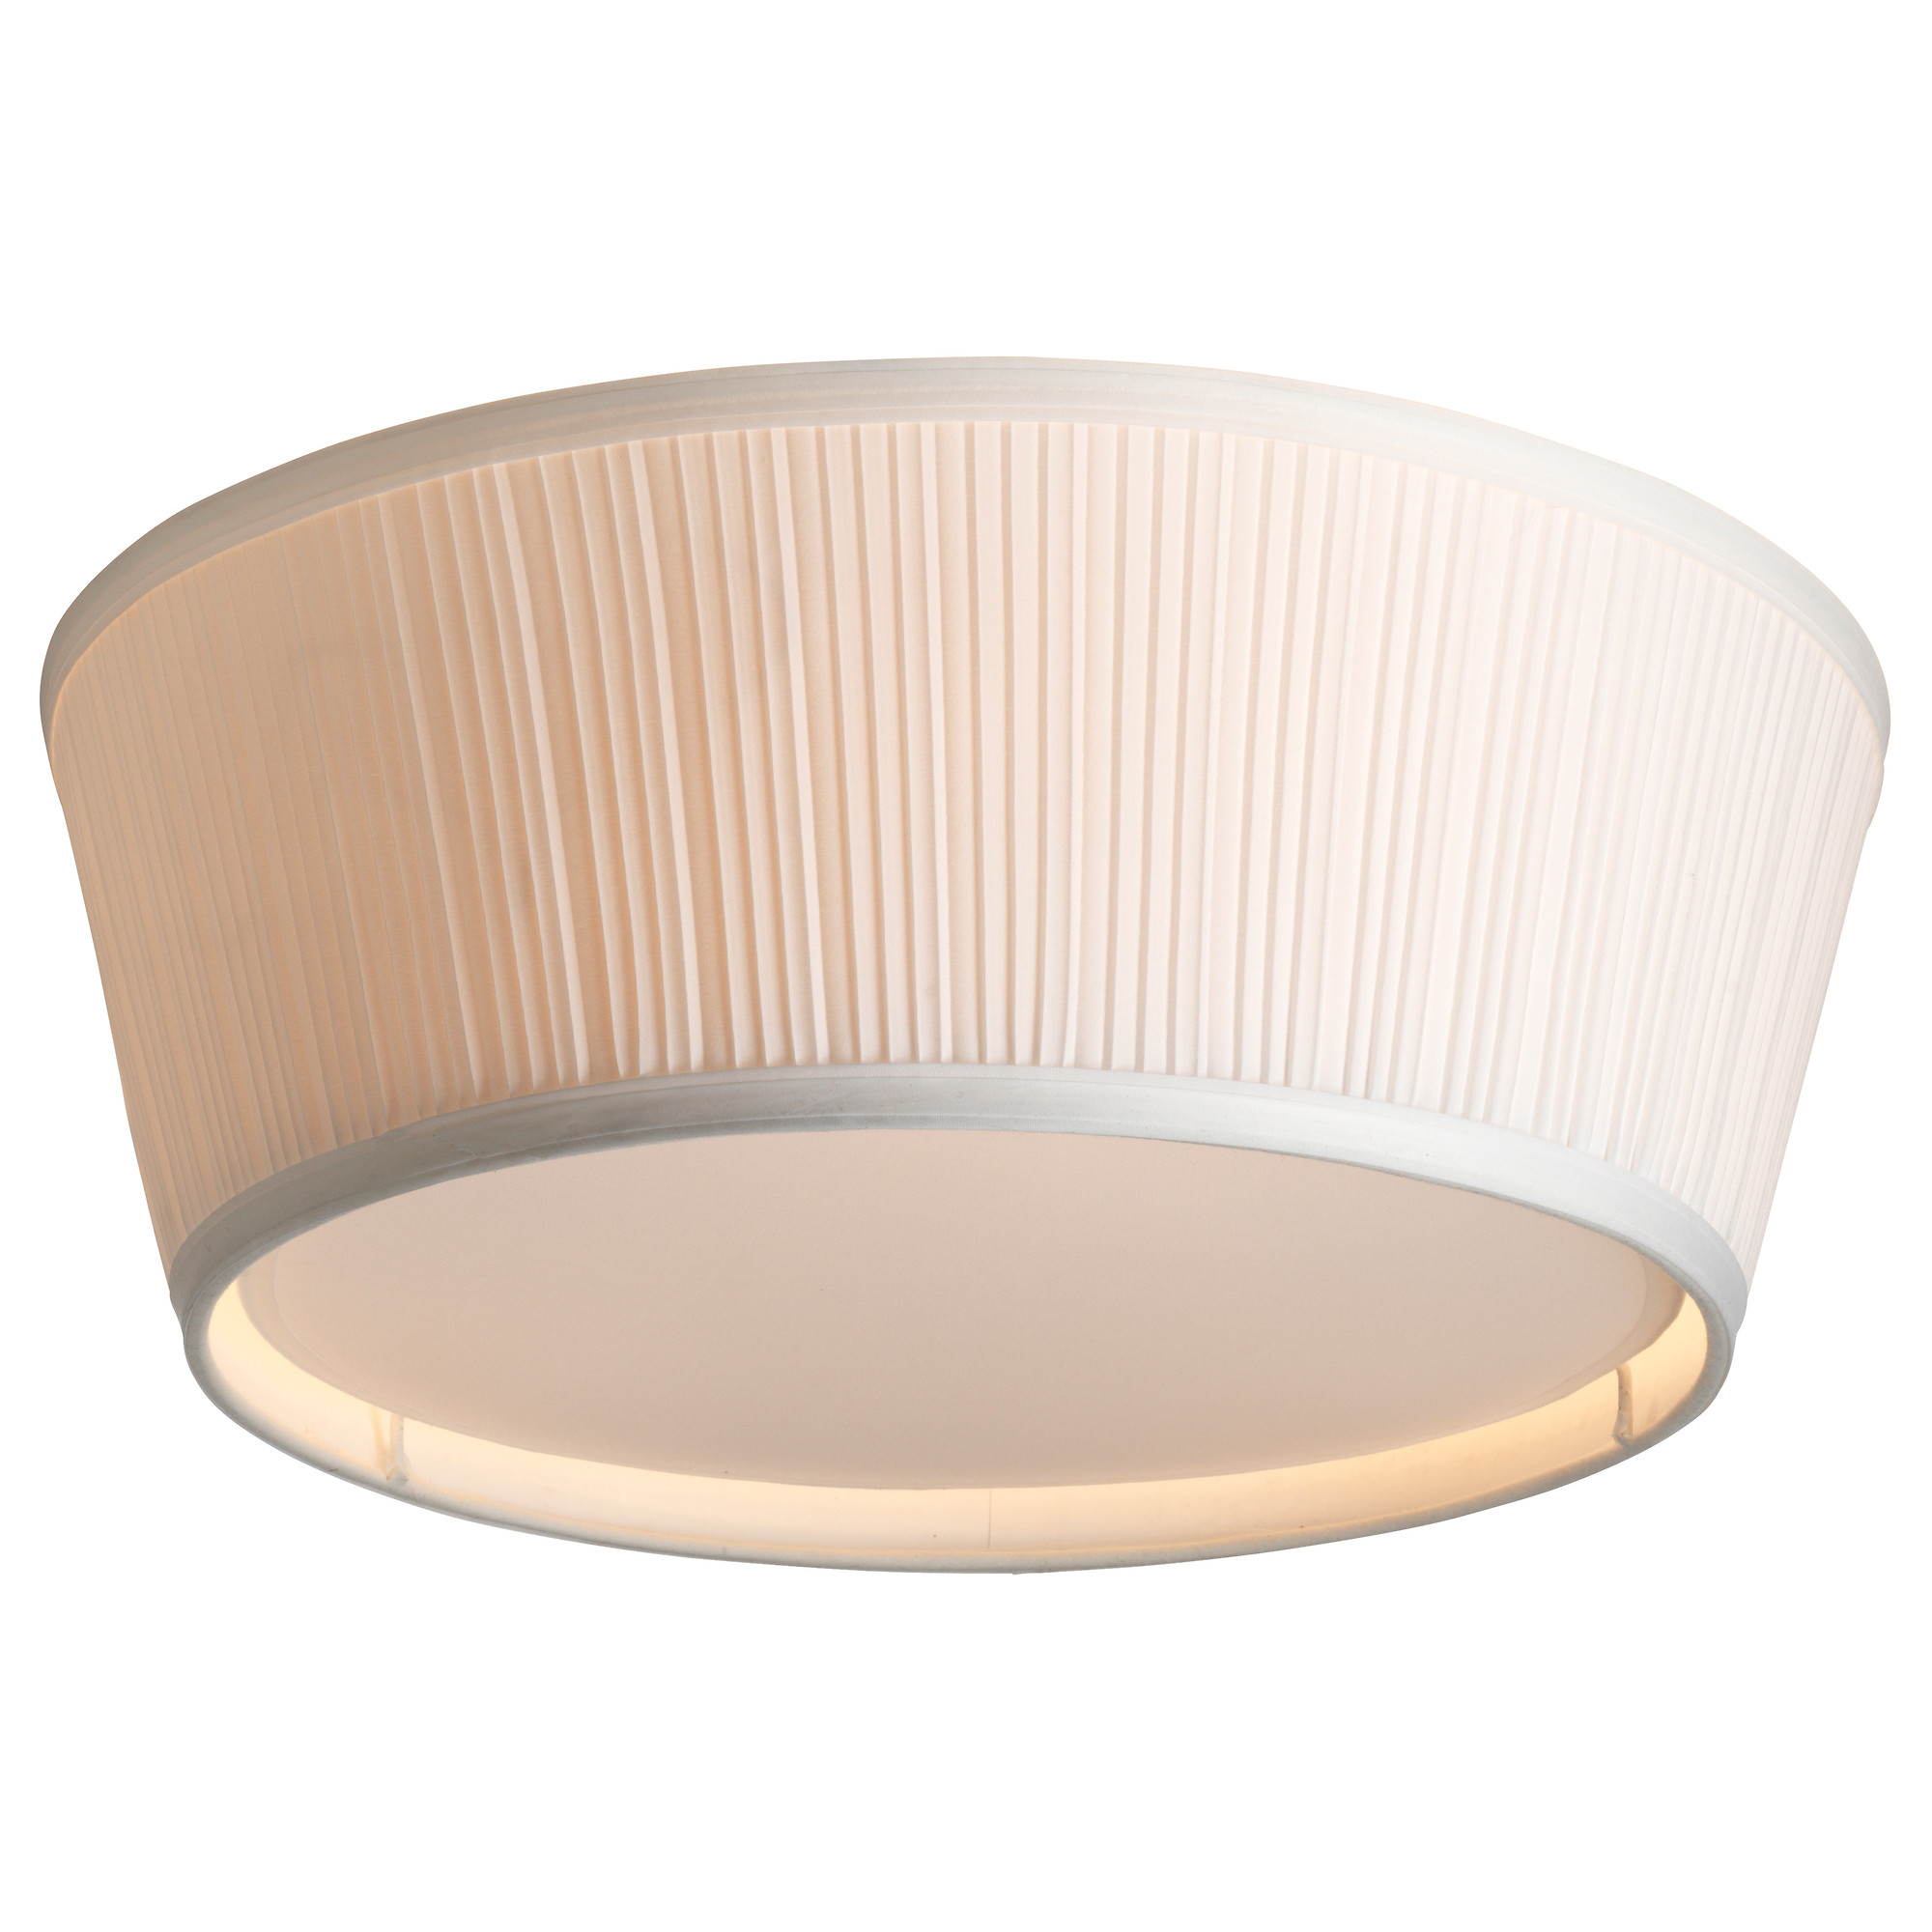 Arstid Ikea Bedroom Ceiling Lamps Komnit Store